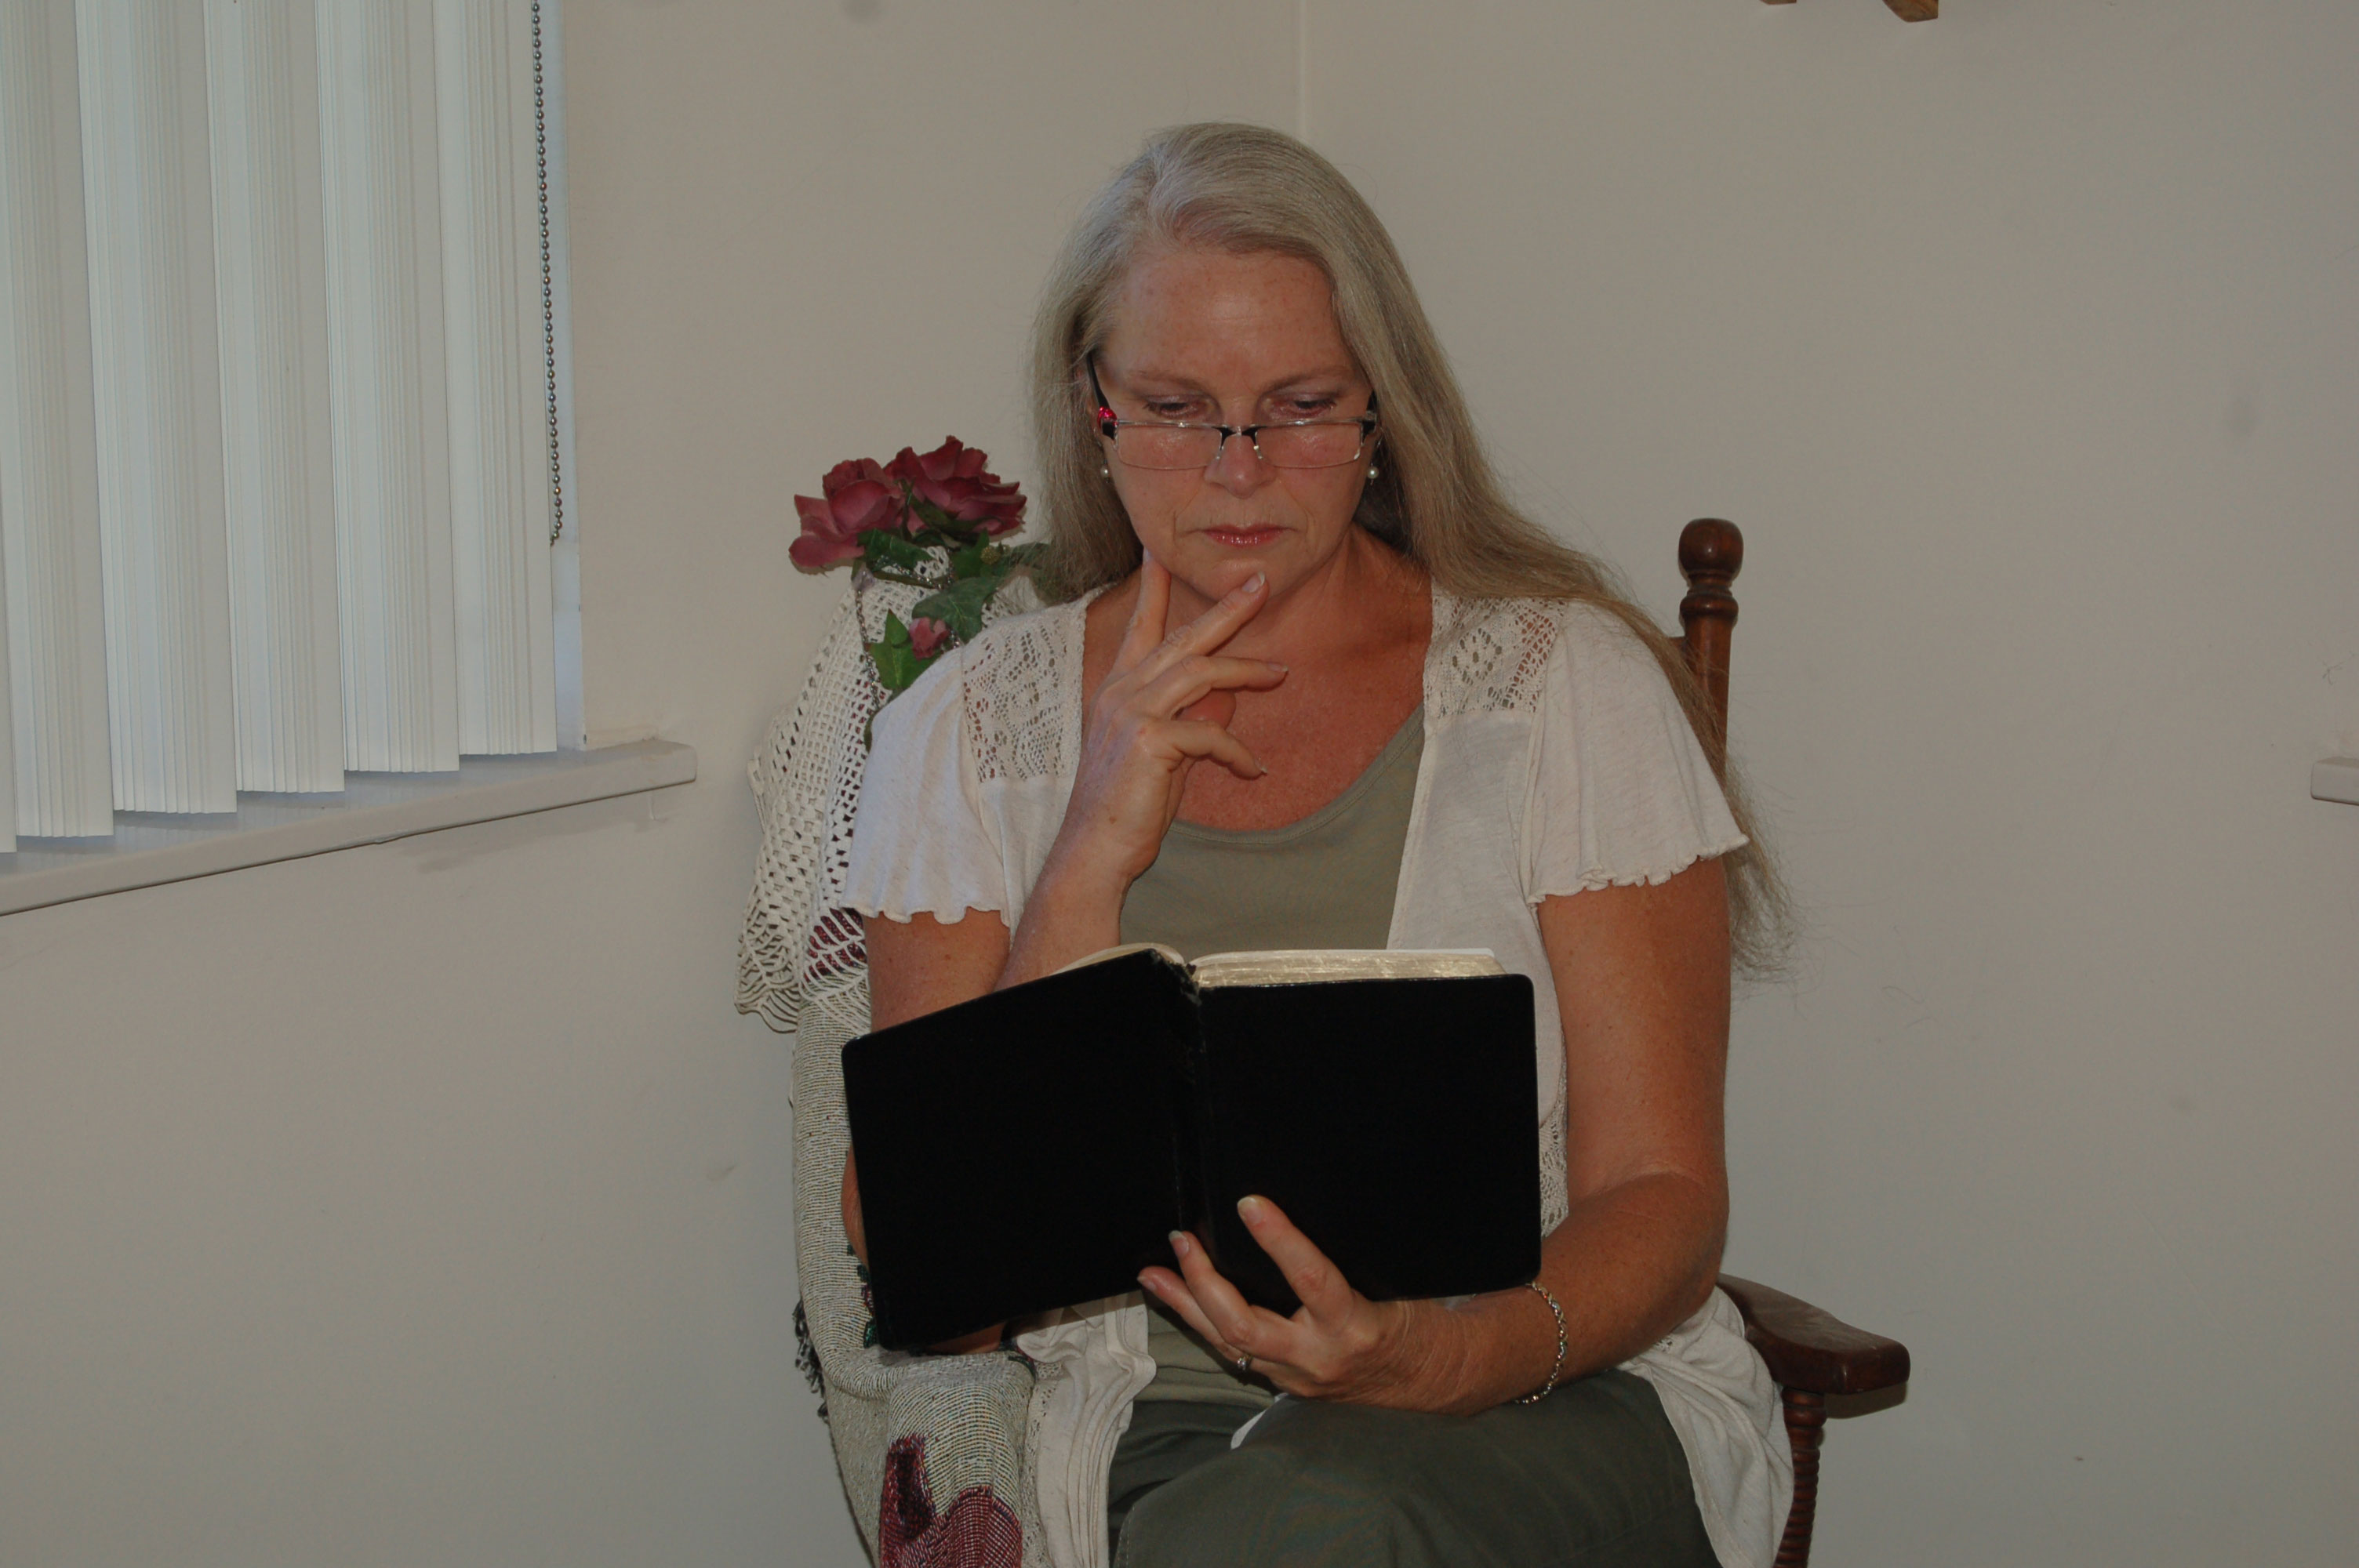 Christian Stock Photos by Linda Bateman - Woman Reading Bible while Sitting in Rocking Chair